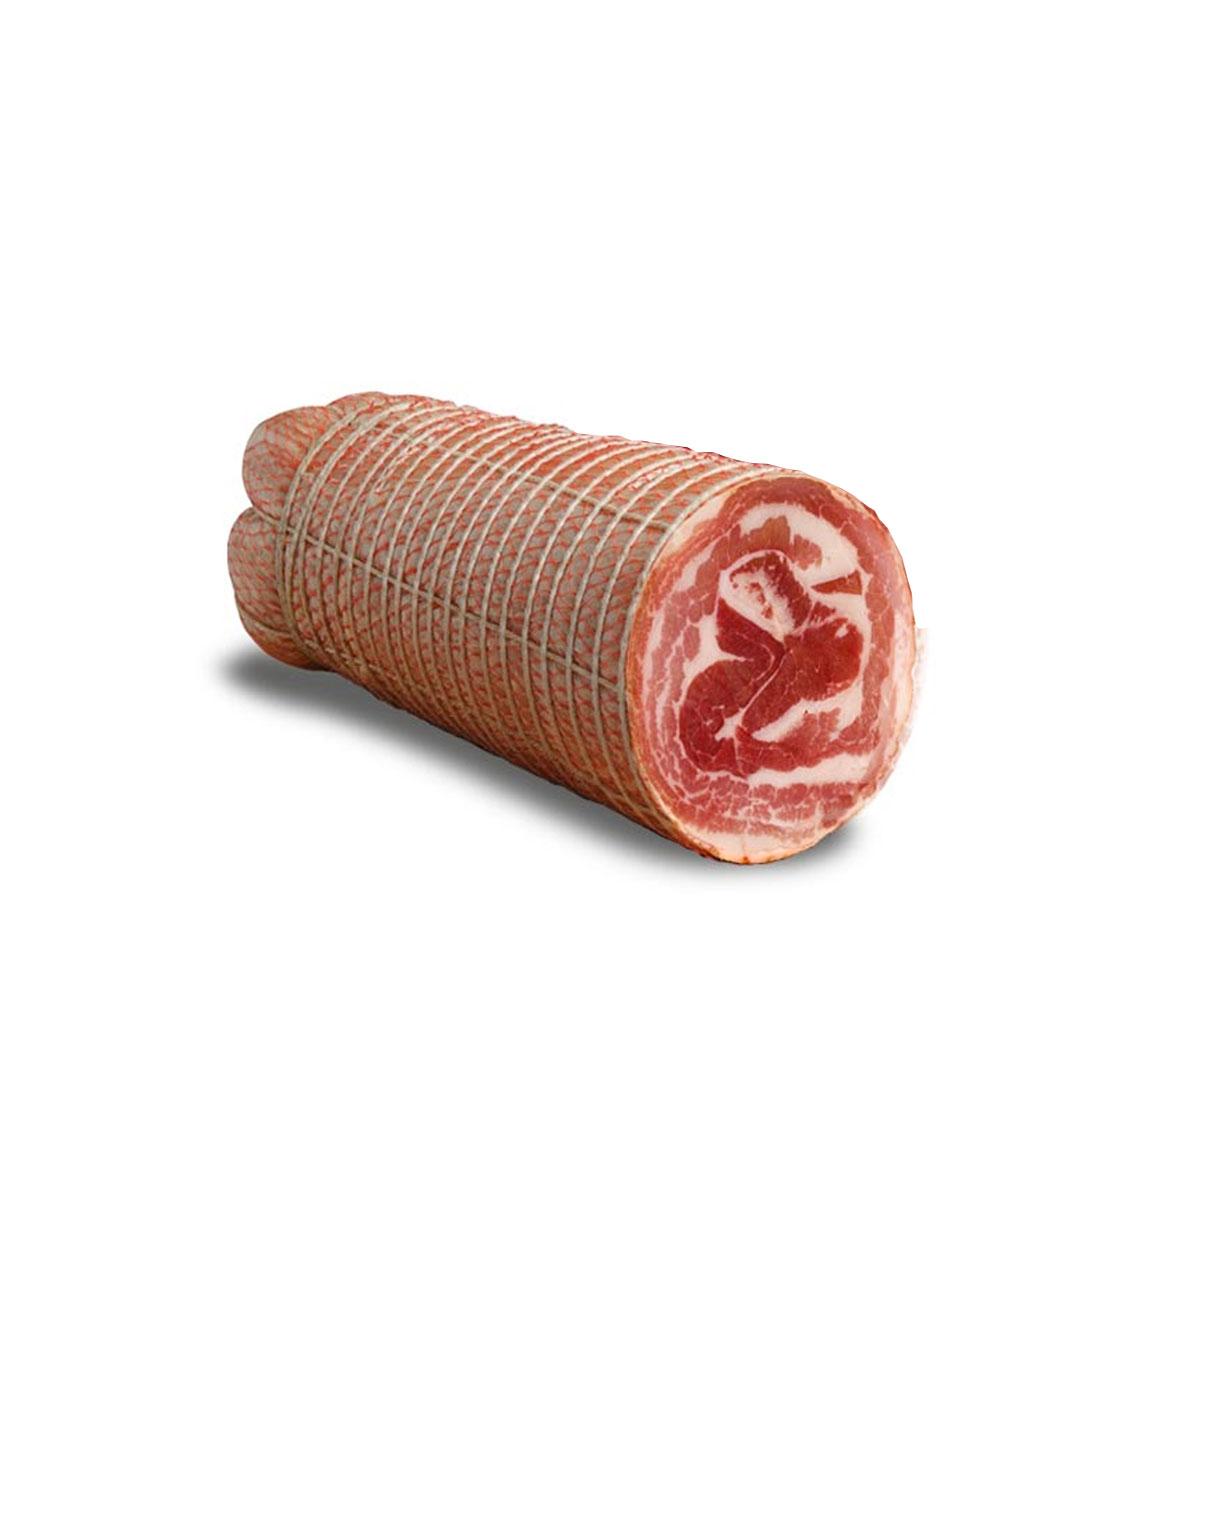 prodotti tipici calabresi pancetta arrotolata